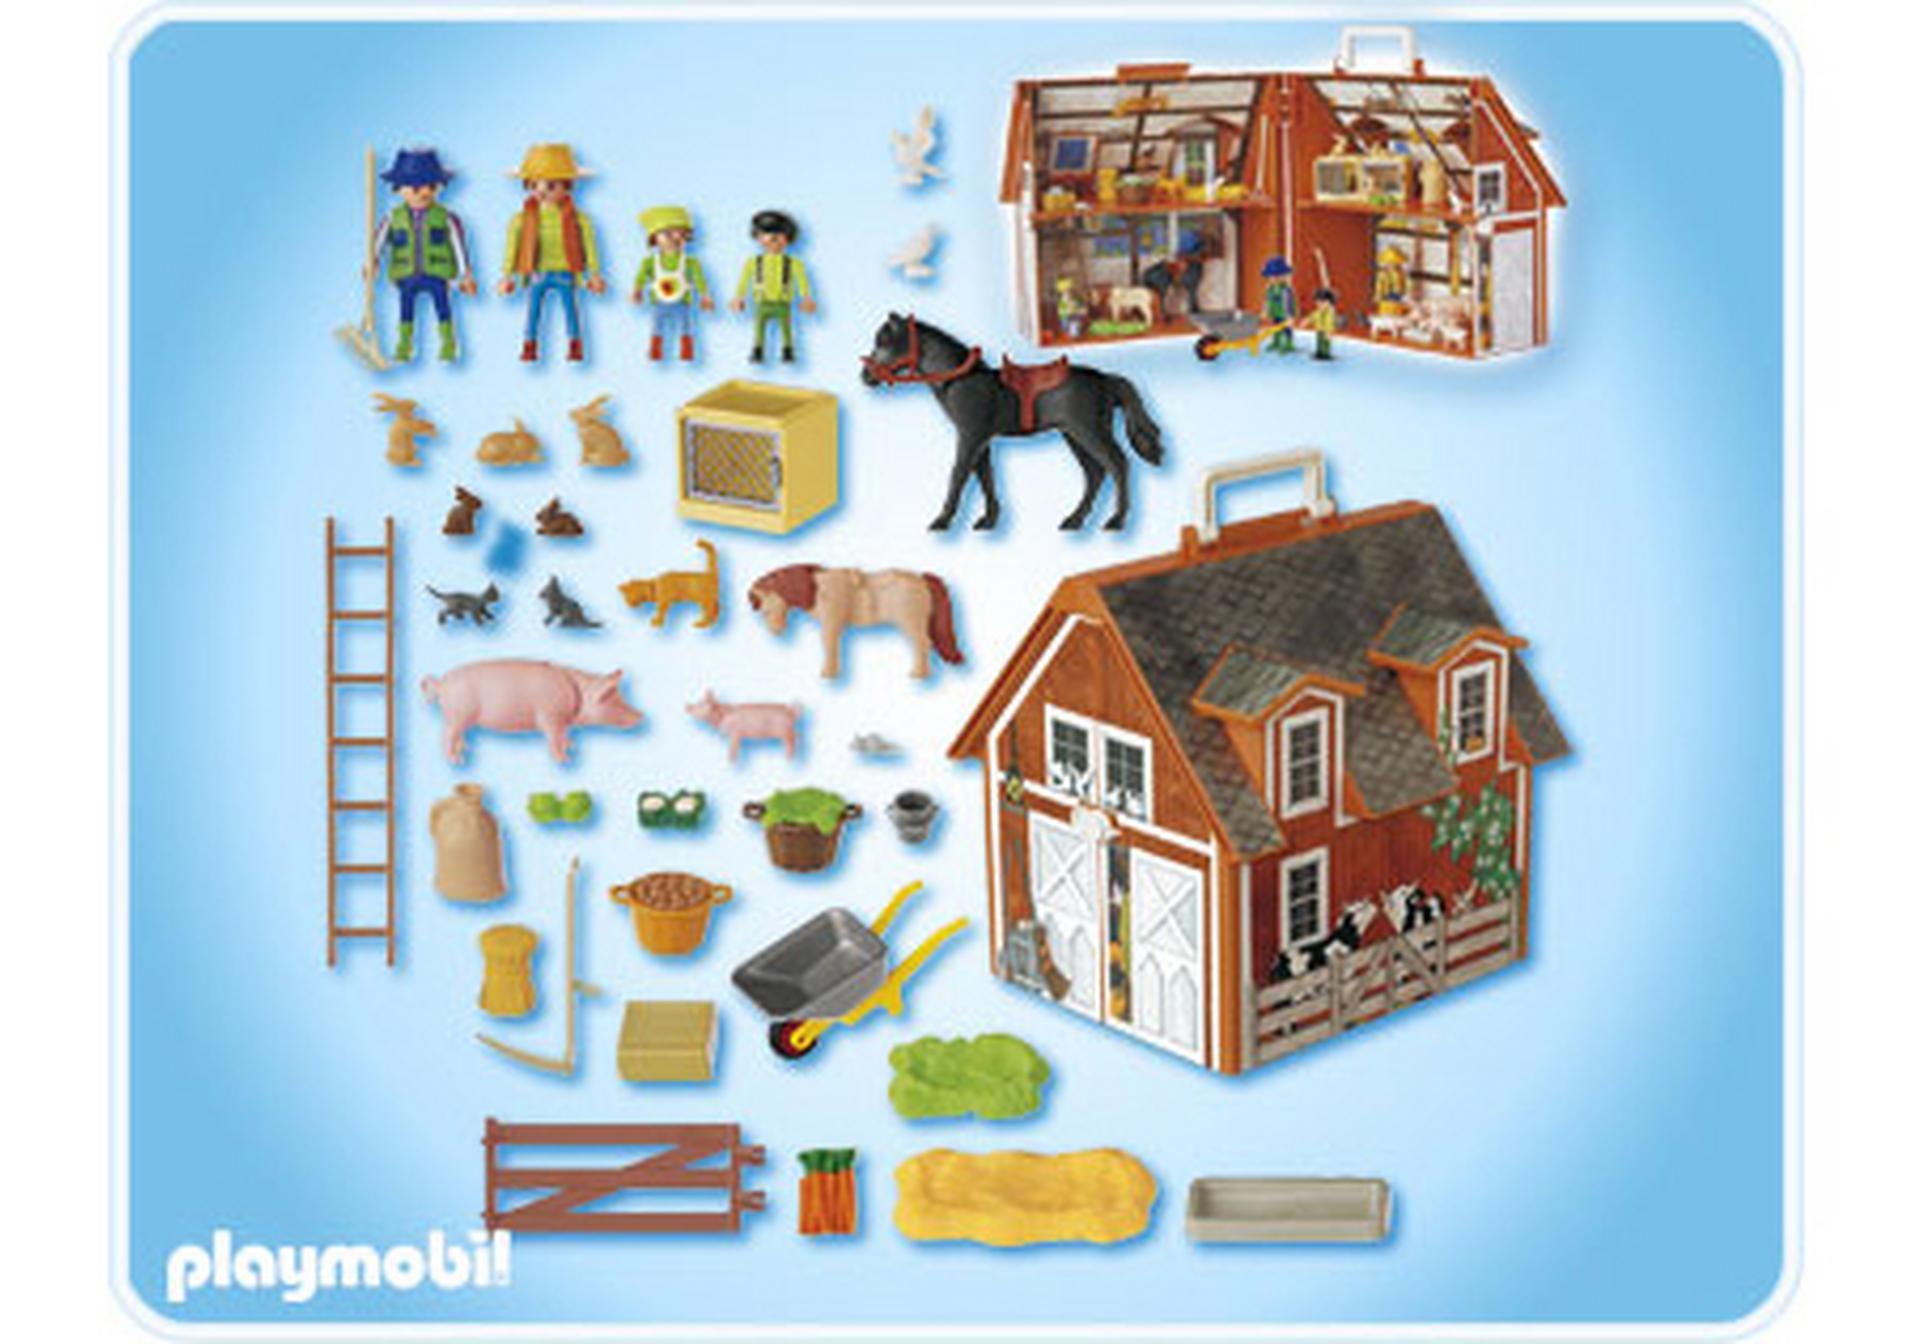 ferme transportable 4142 a playmobil france. Black Bedroom Furniture Sets. Home Design Ideas